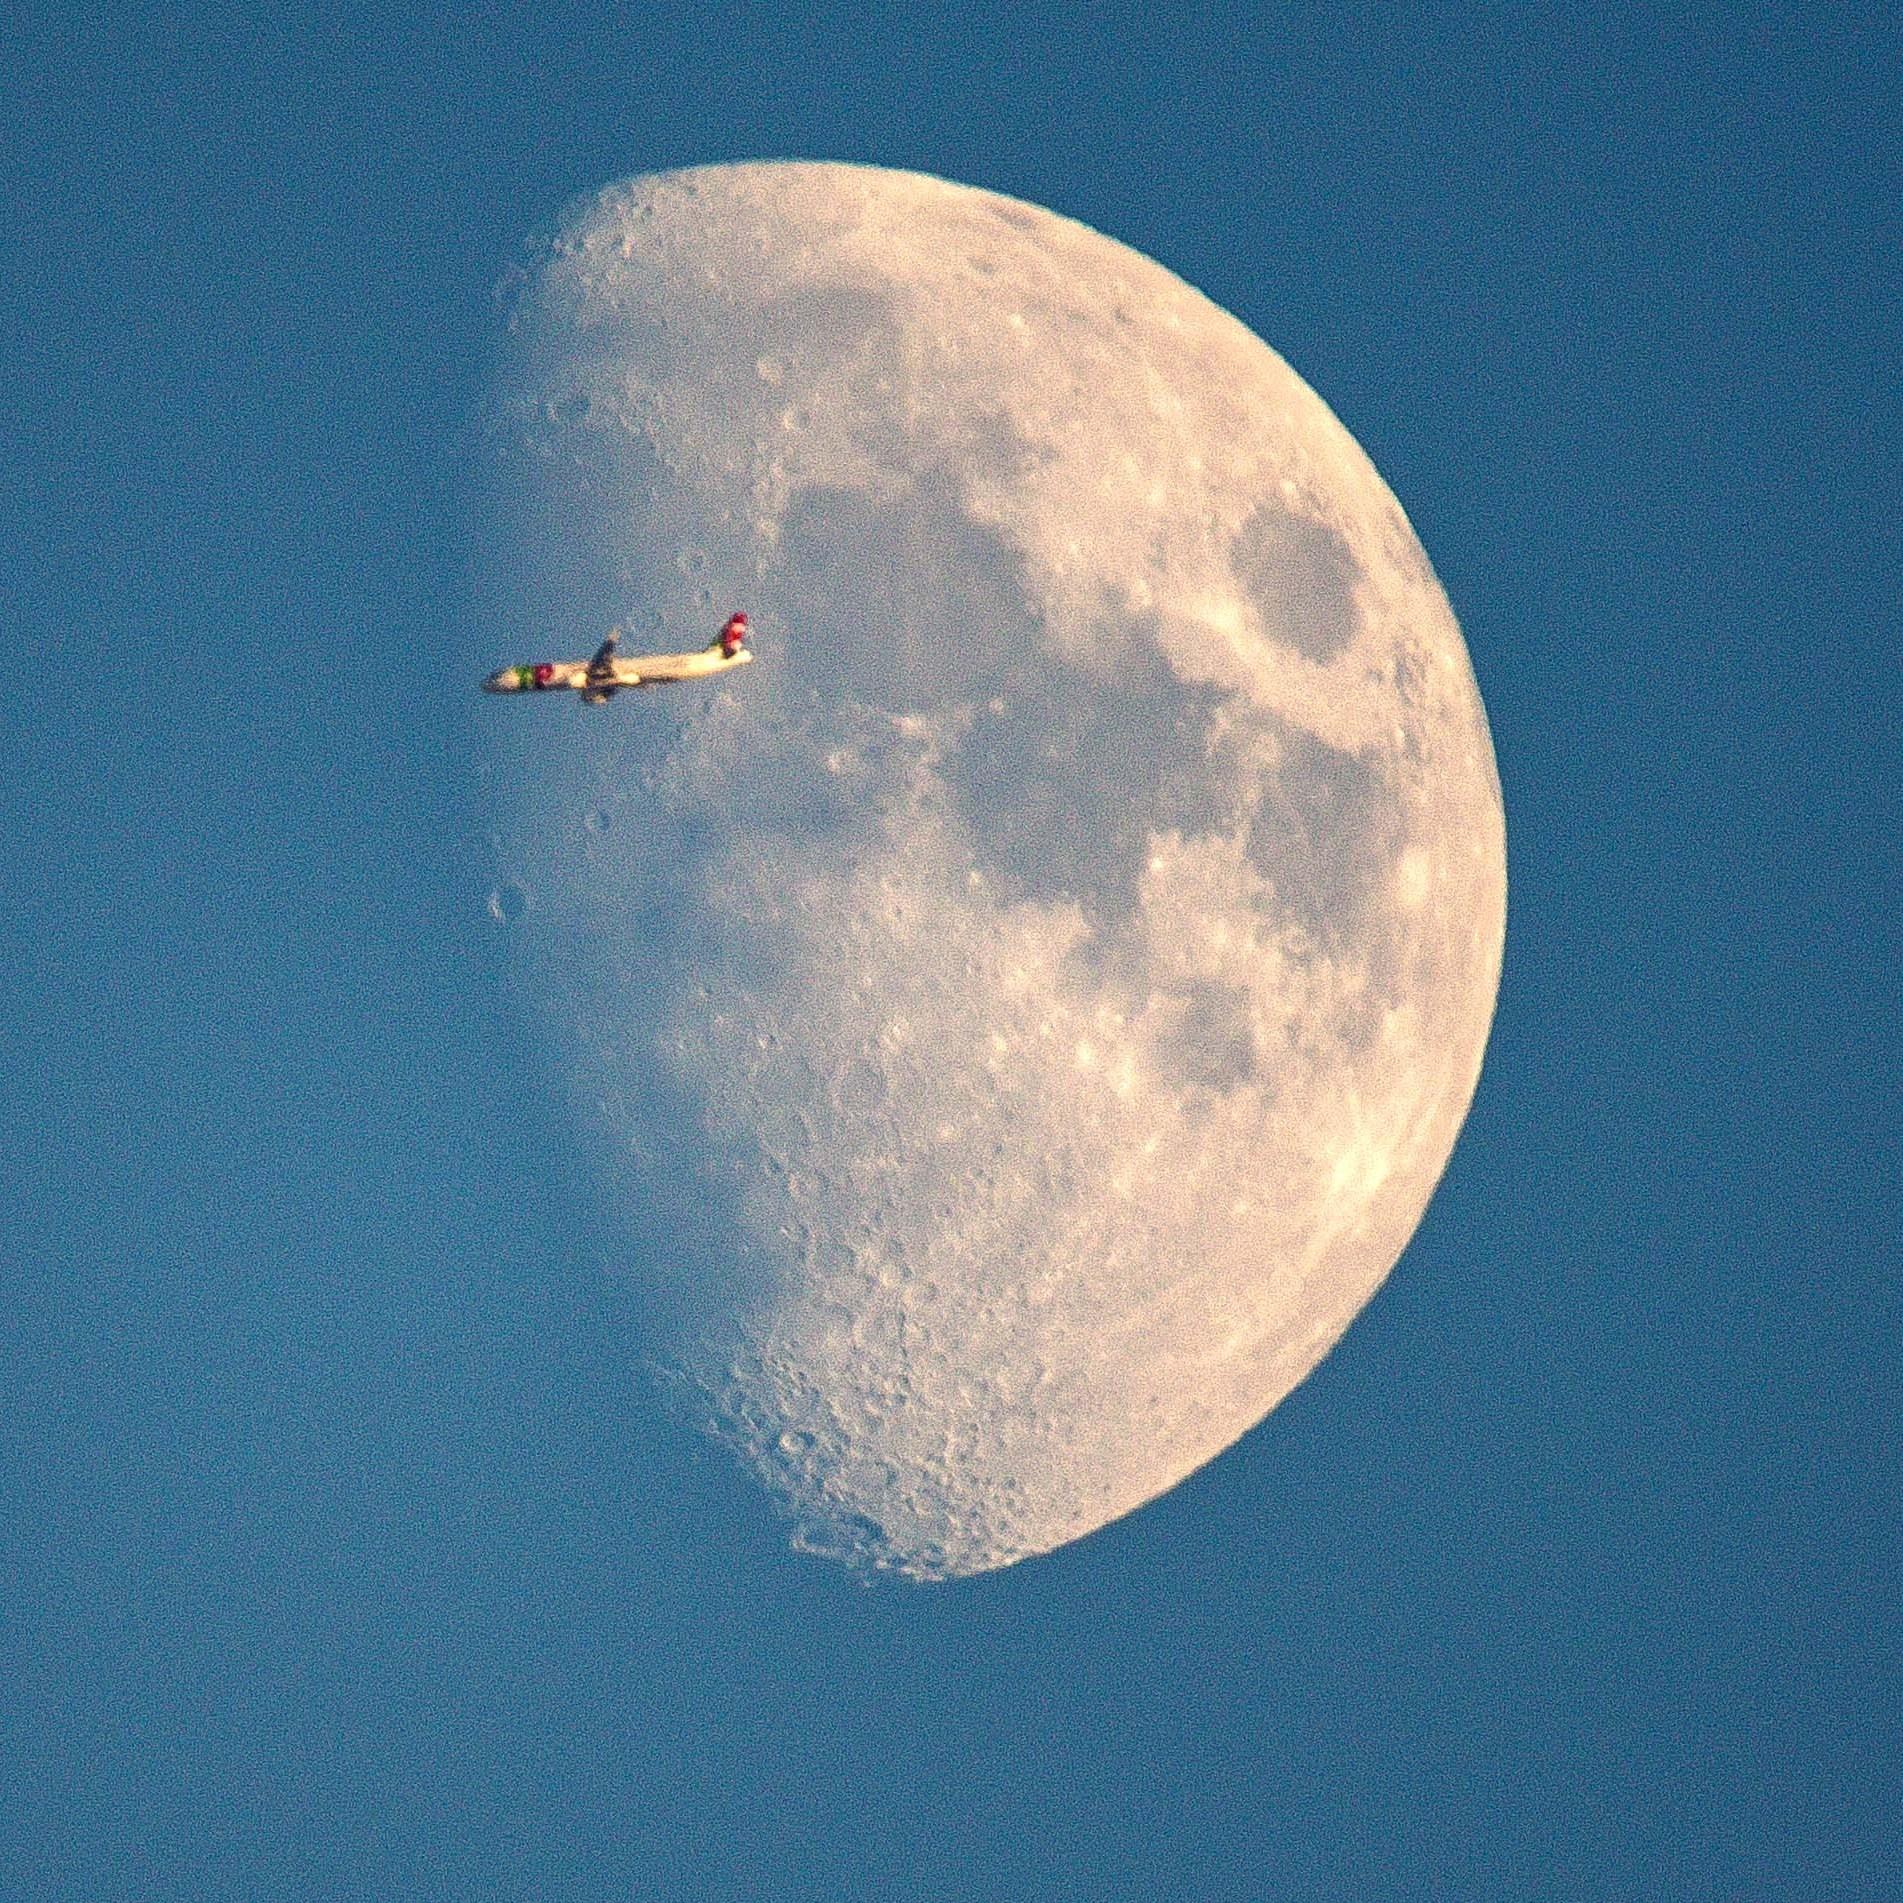 Nikon D800 Sigma Moon